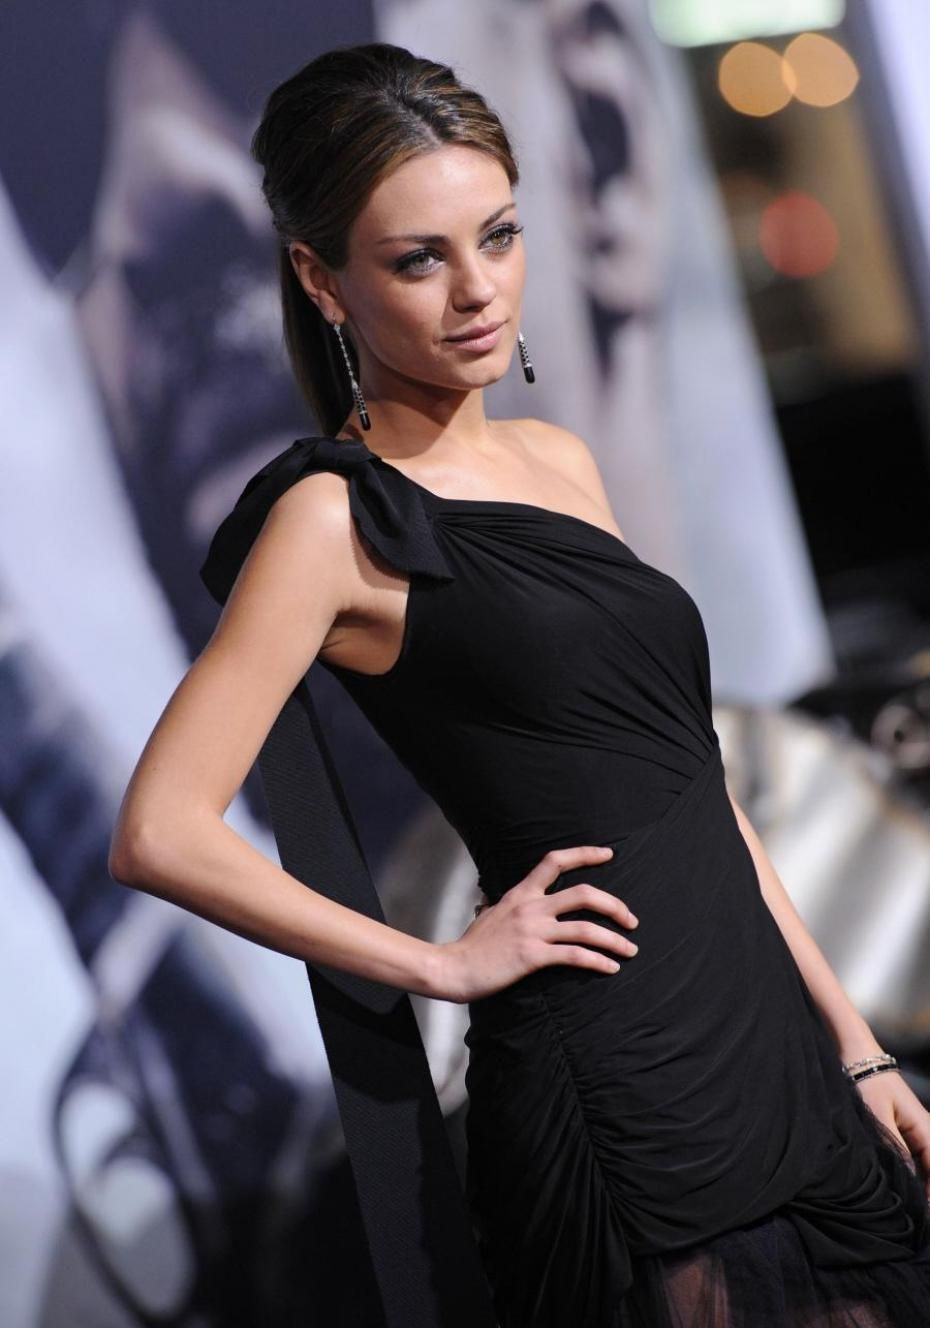 mila kunis black swan - Google Search | fashion 4 ... Mila Kunis Black Swan Body